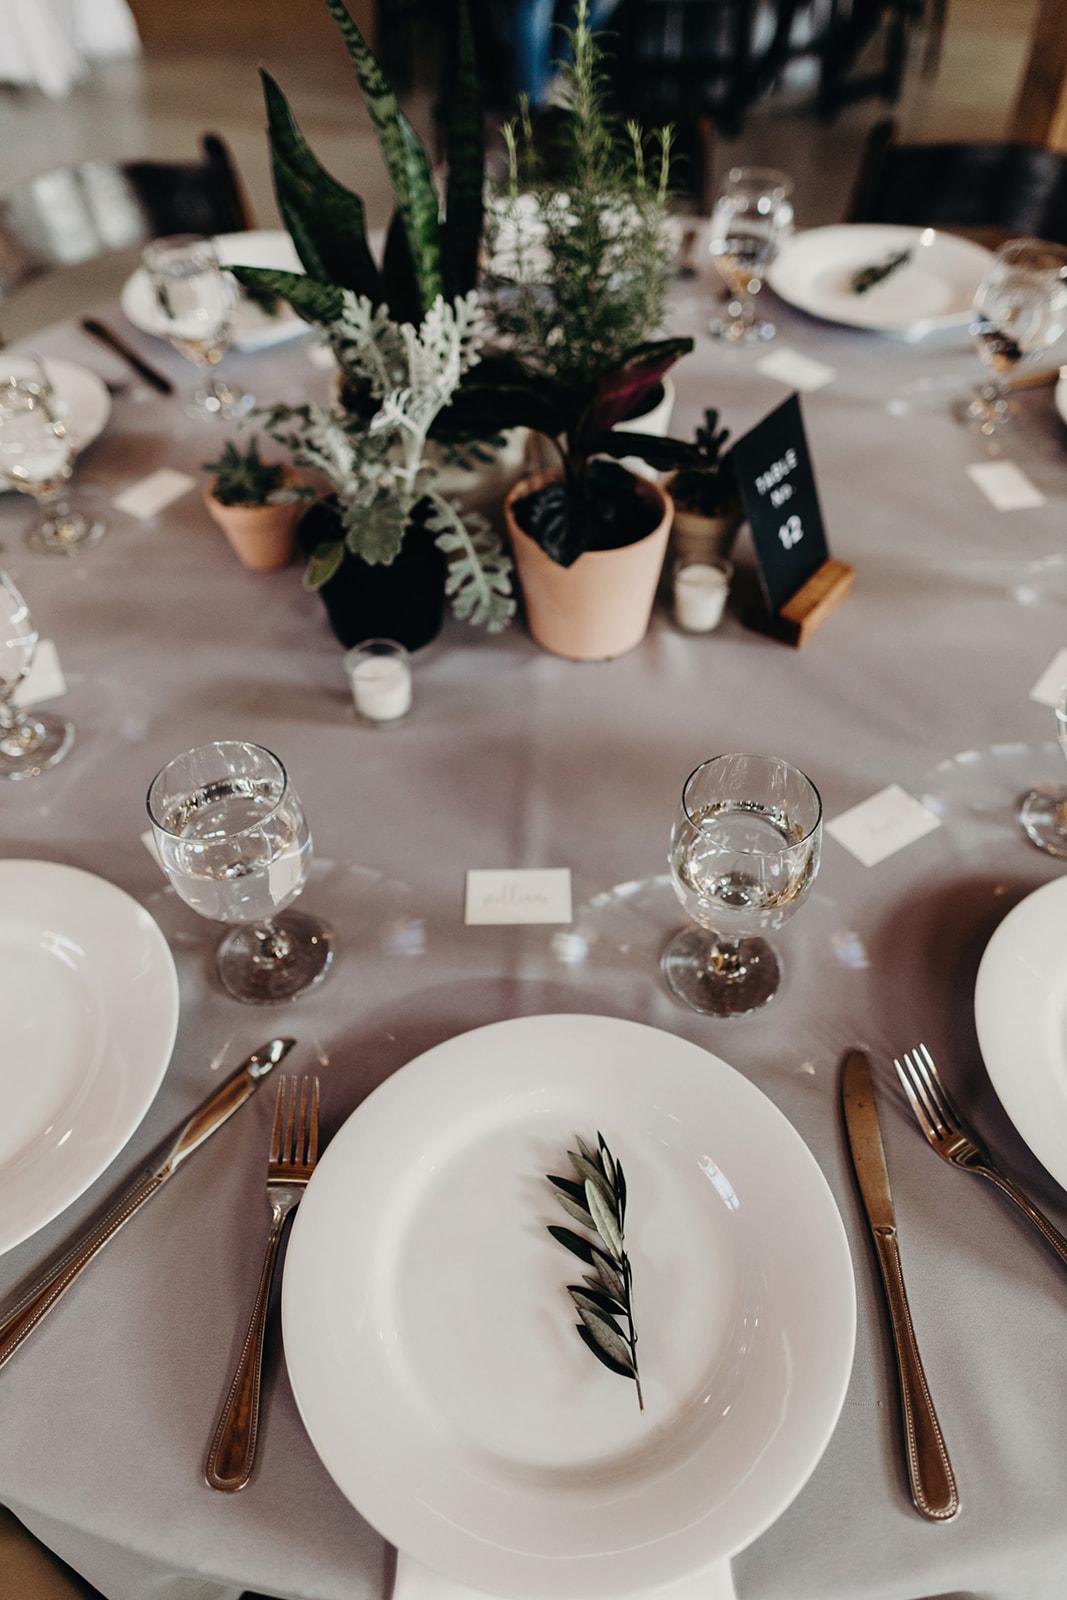 austin-wedding-lindsey-bryce-595.jpg